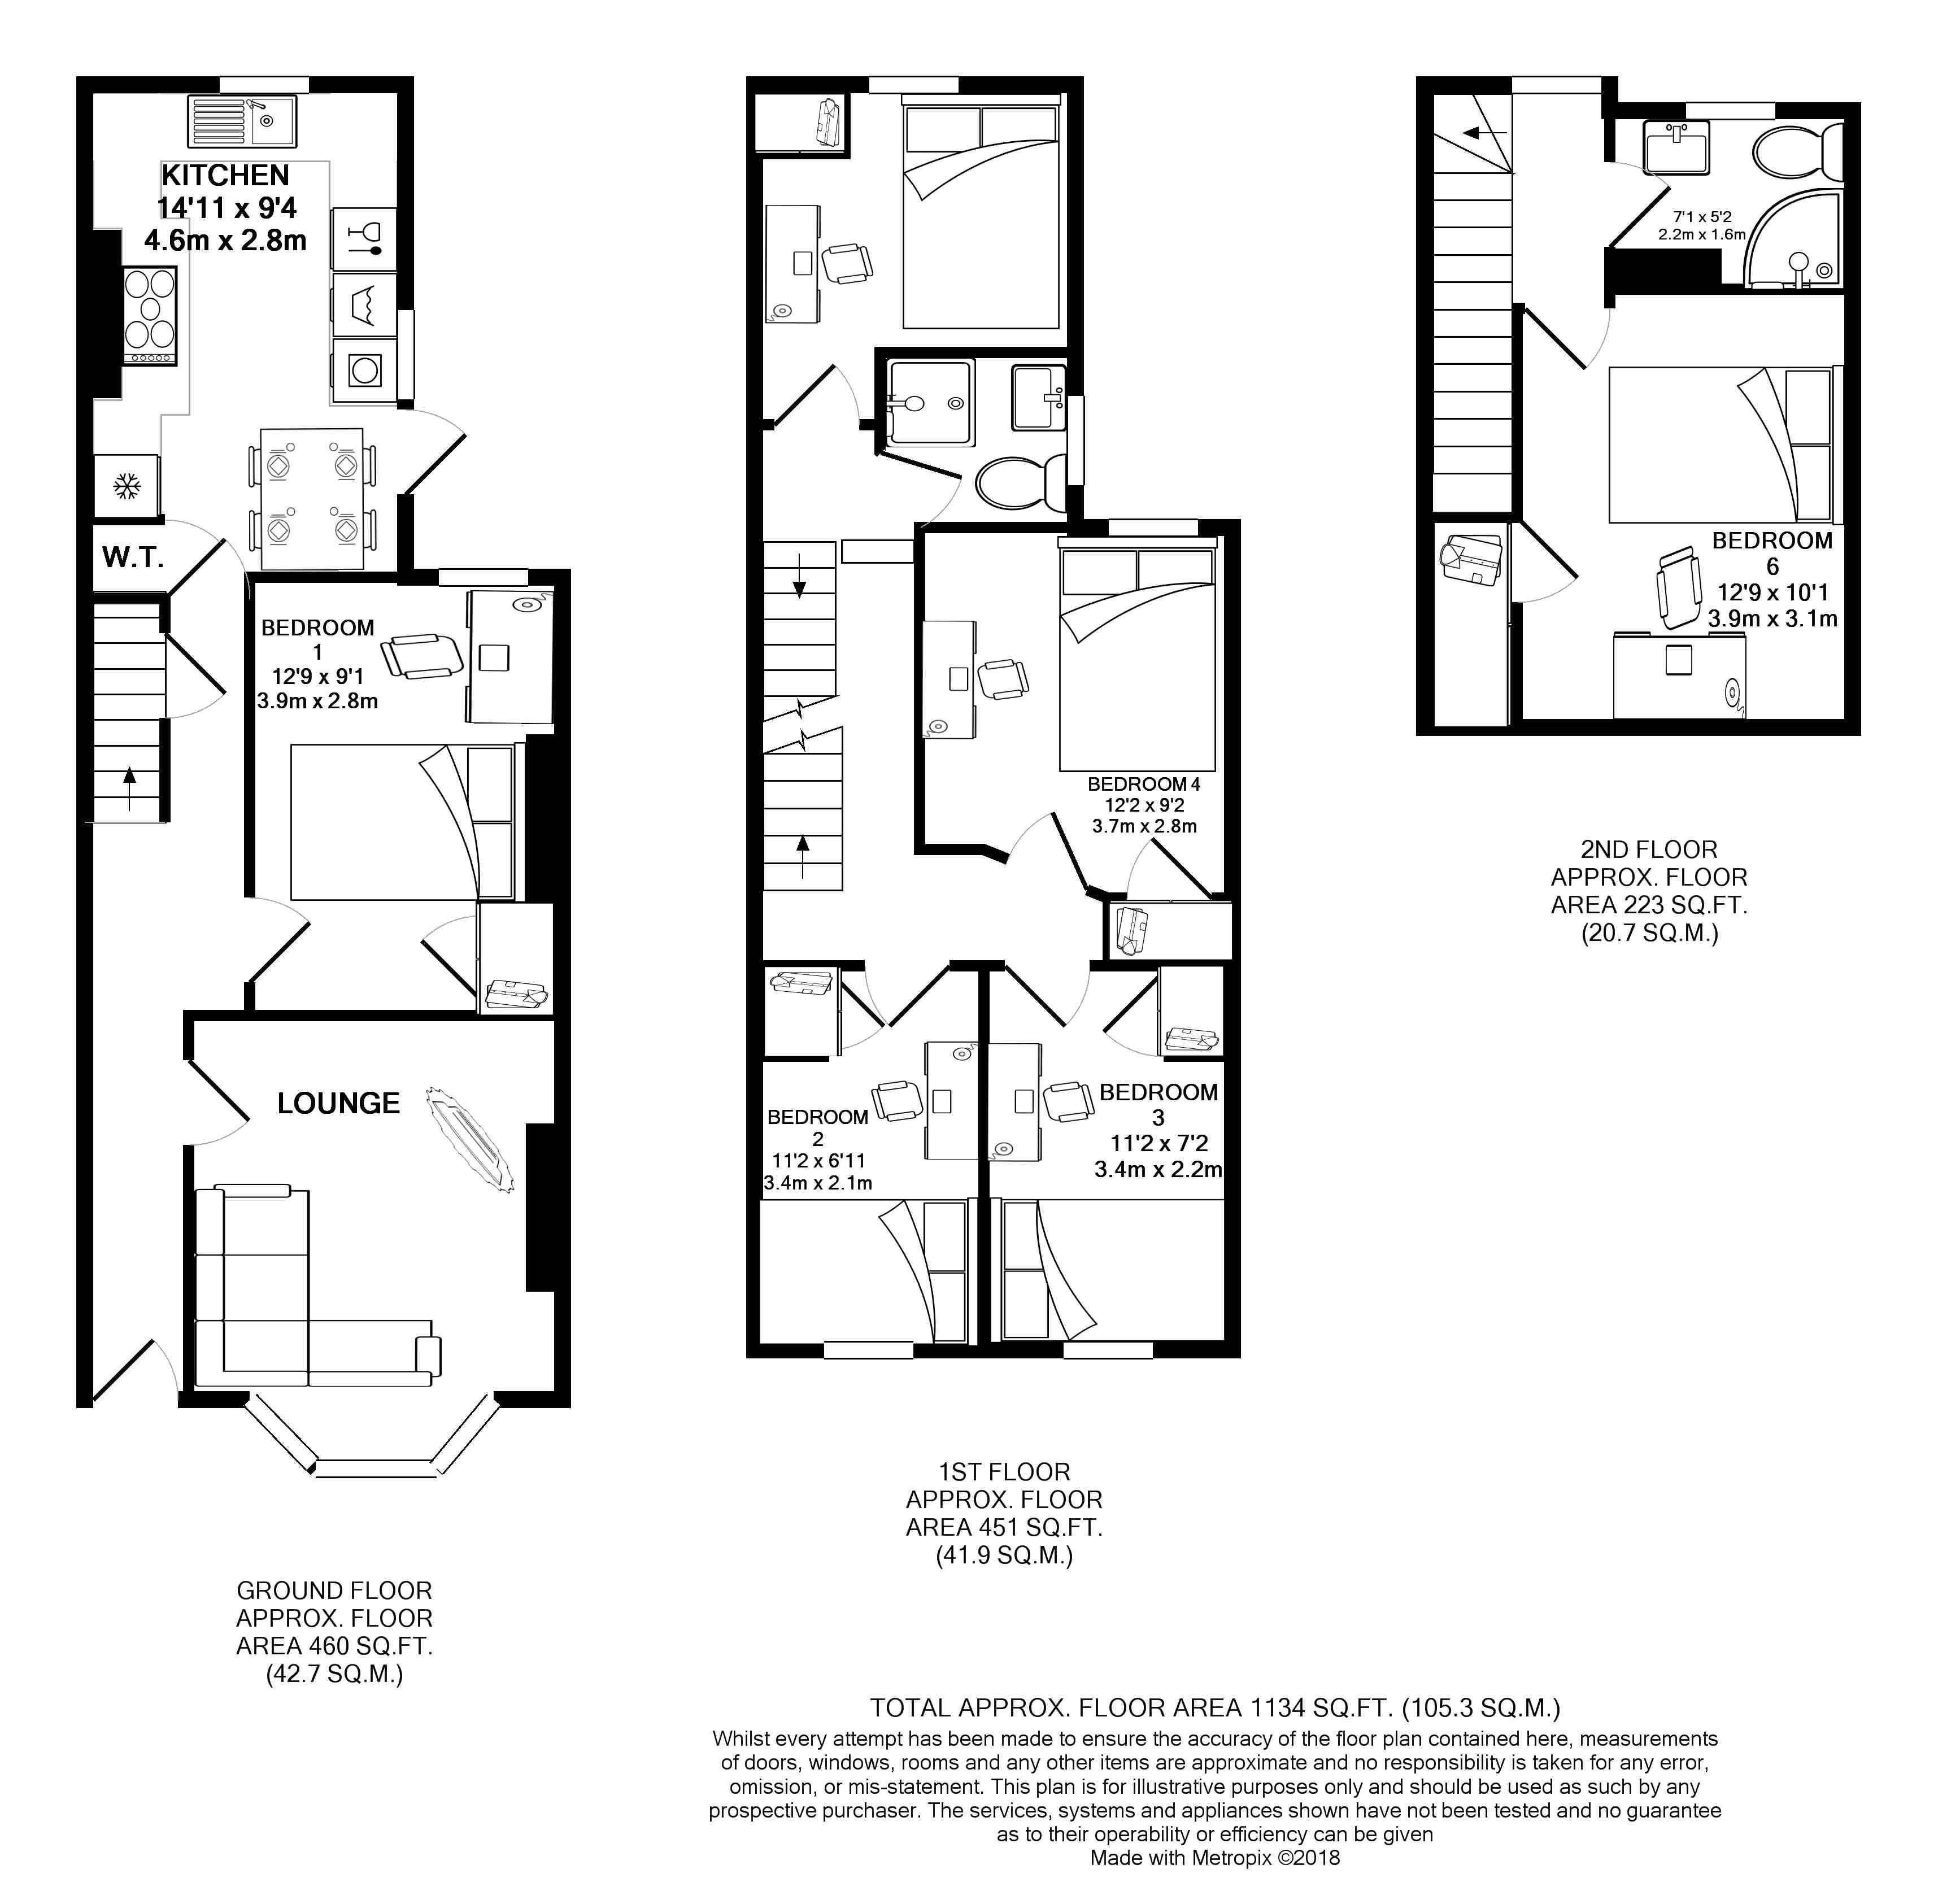 44 Manston Road 6 Bedroom Student House